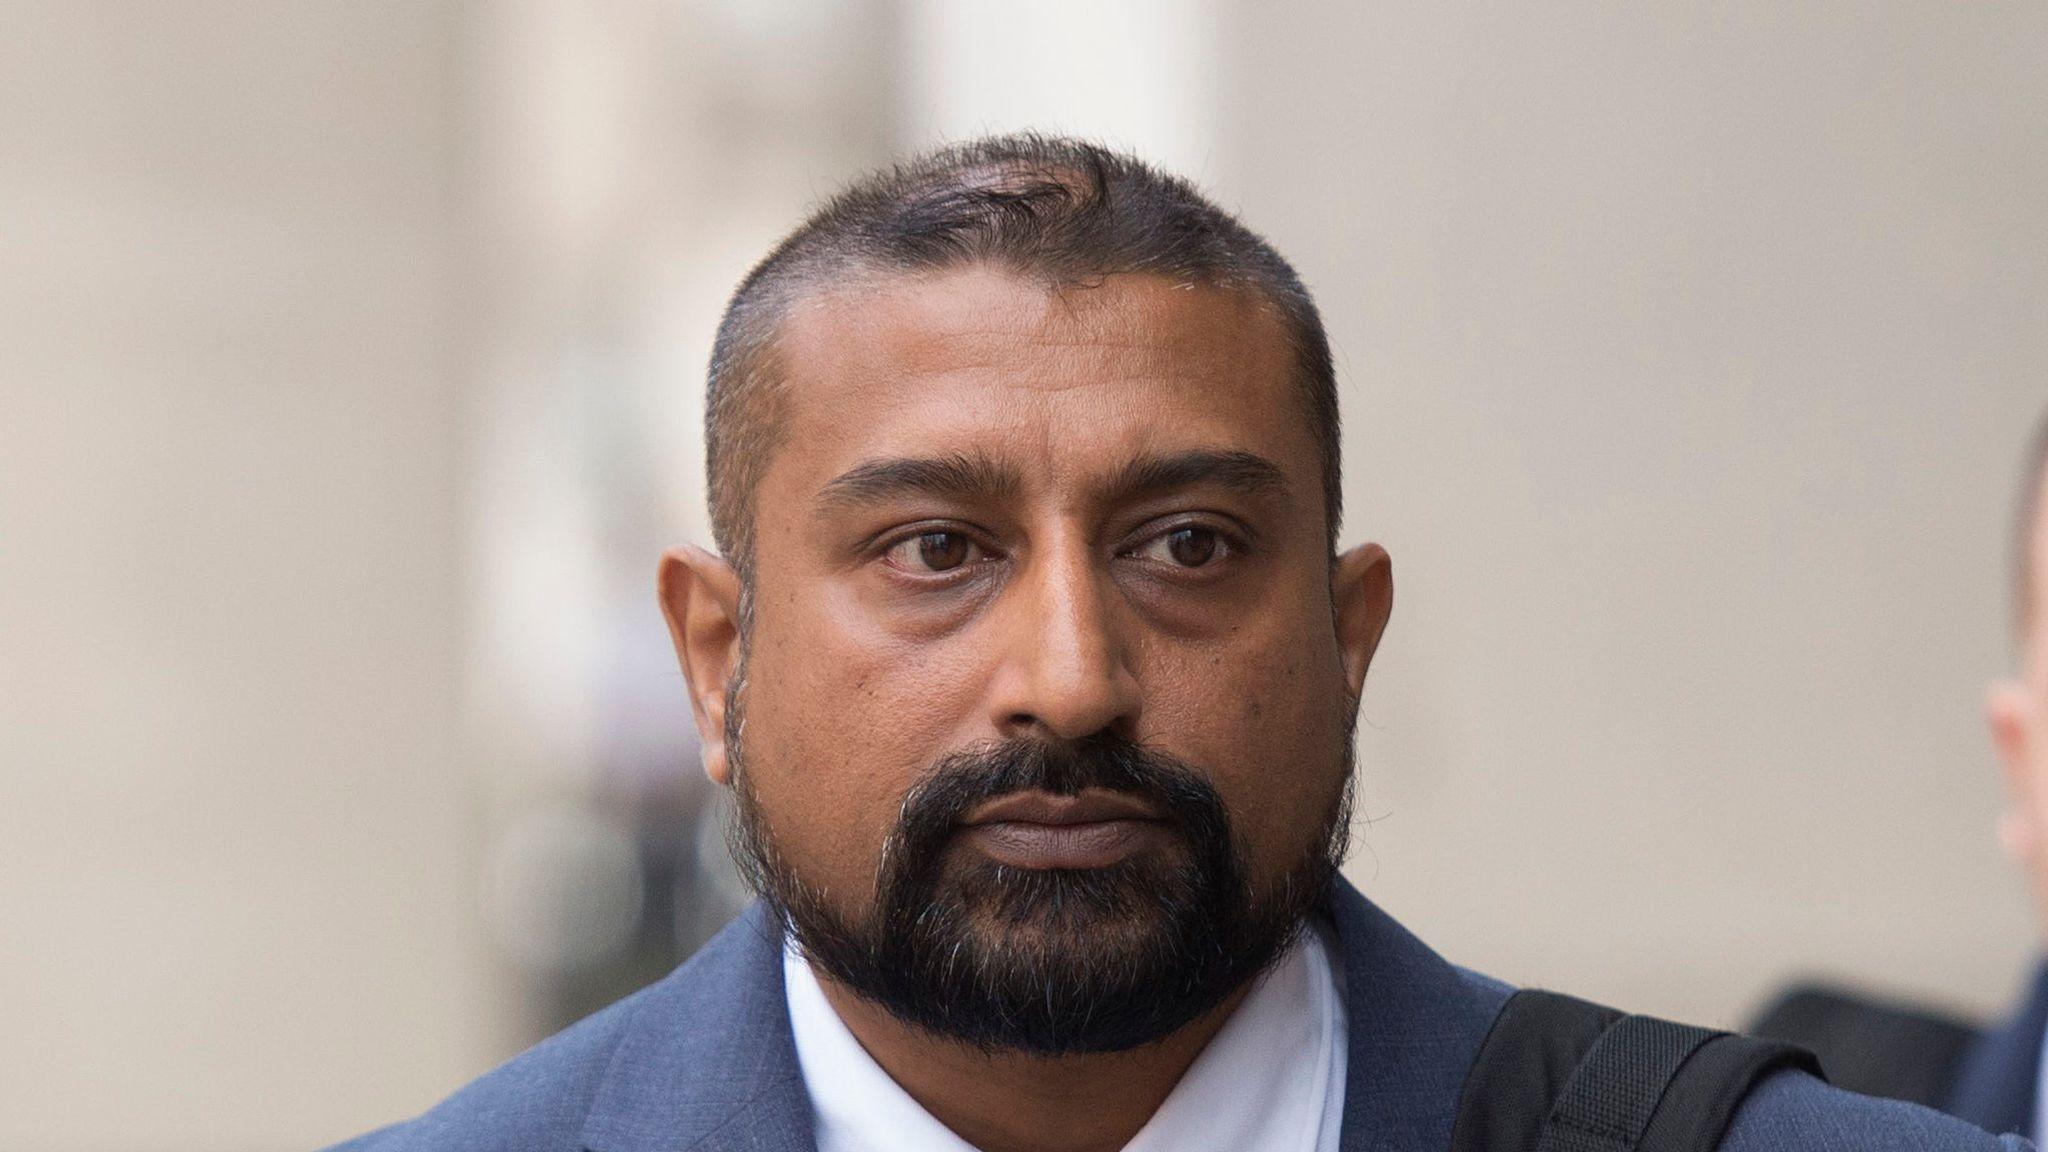 PC Avi Maharaj jailed for using grieving family's TV account